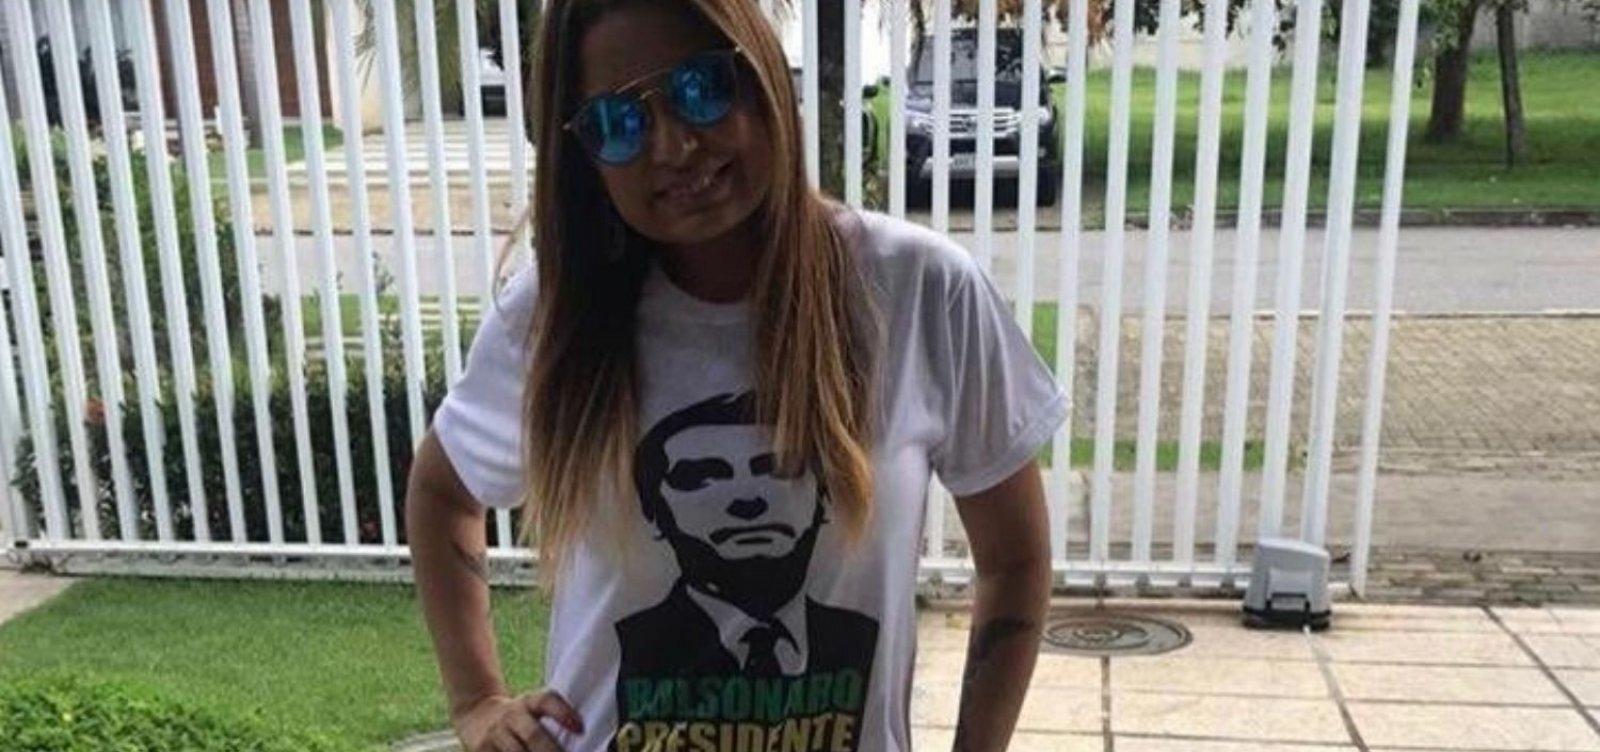 [Promotora de coletiva sobre caso Marielle fez campanha para Bolsonaro]